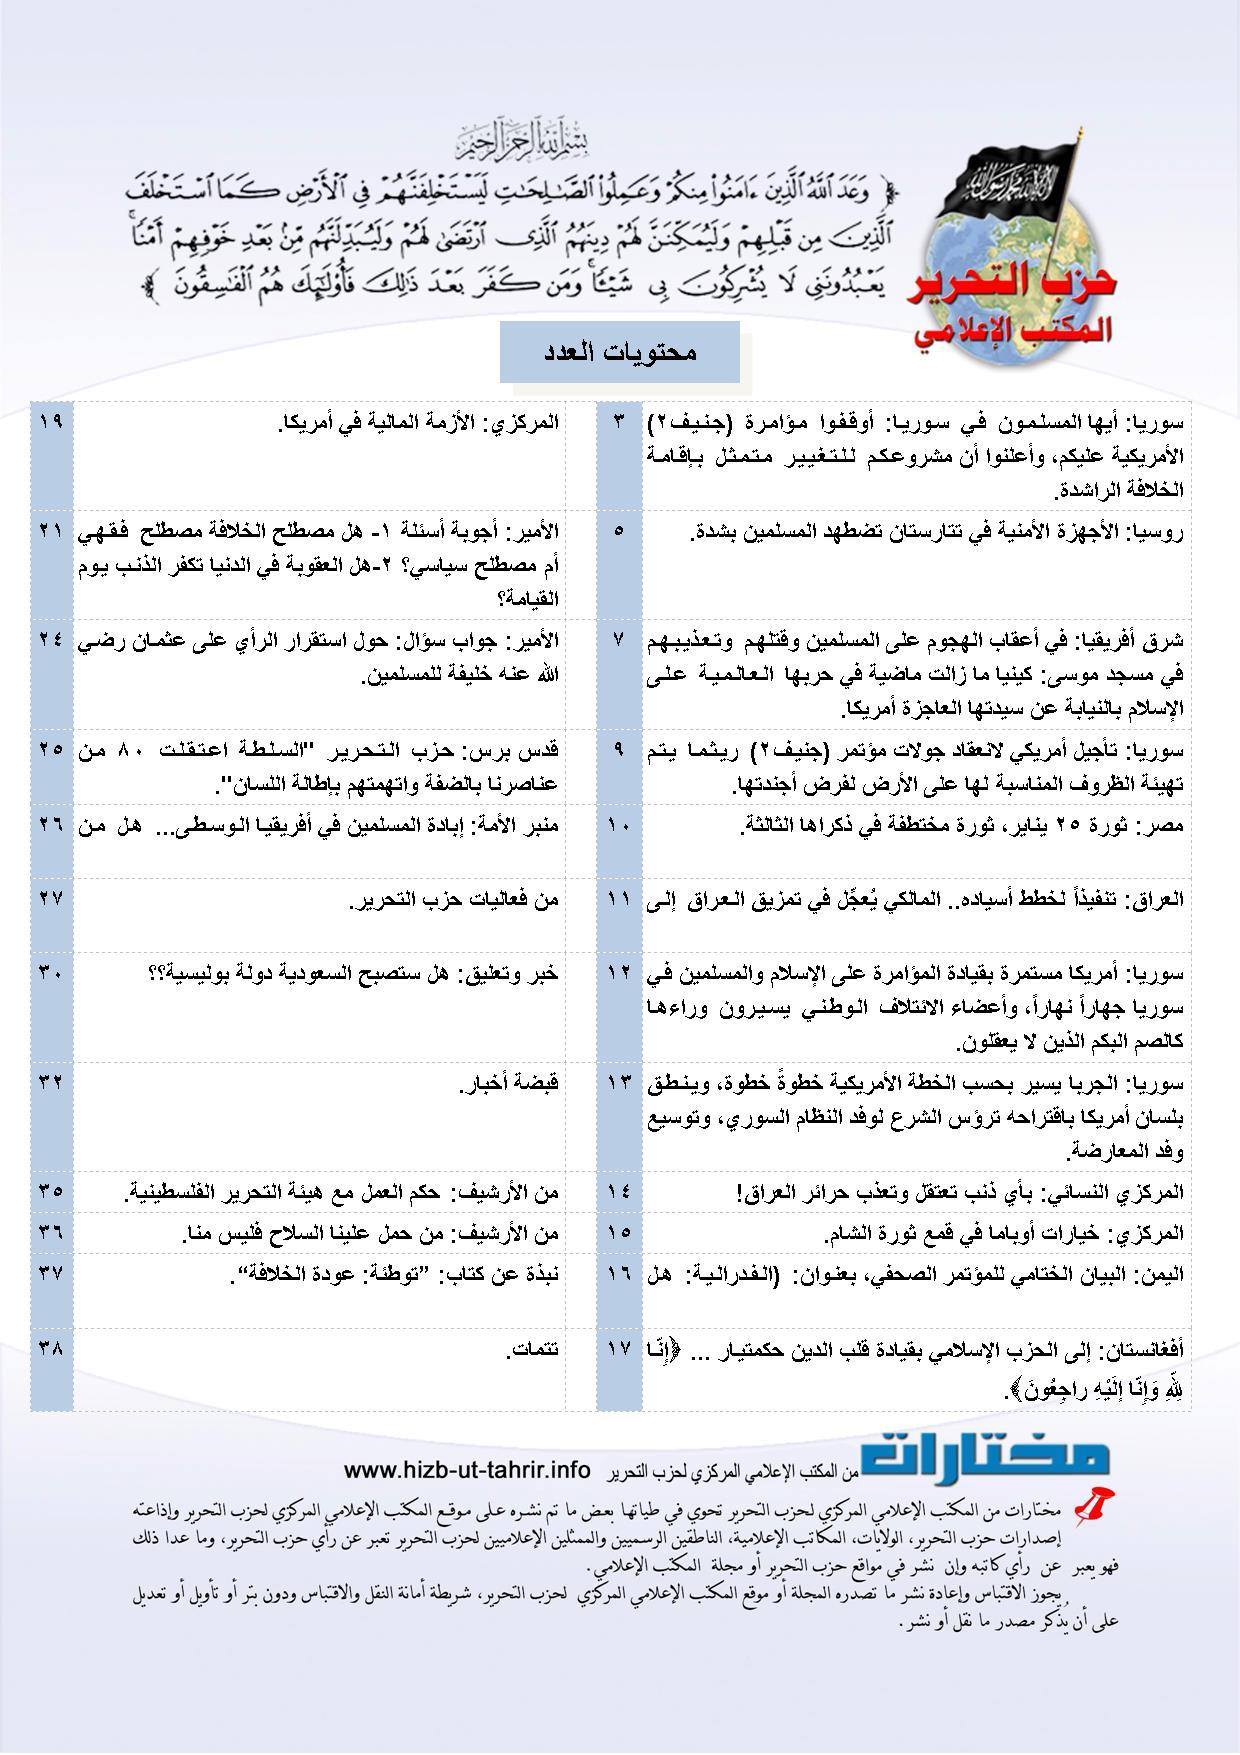 fahras_muk_67_ar.jpg